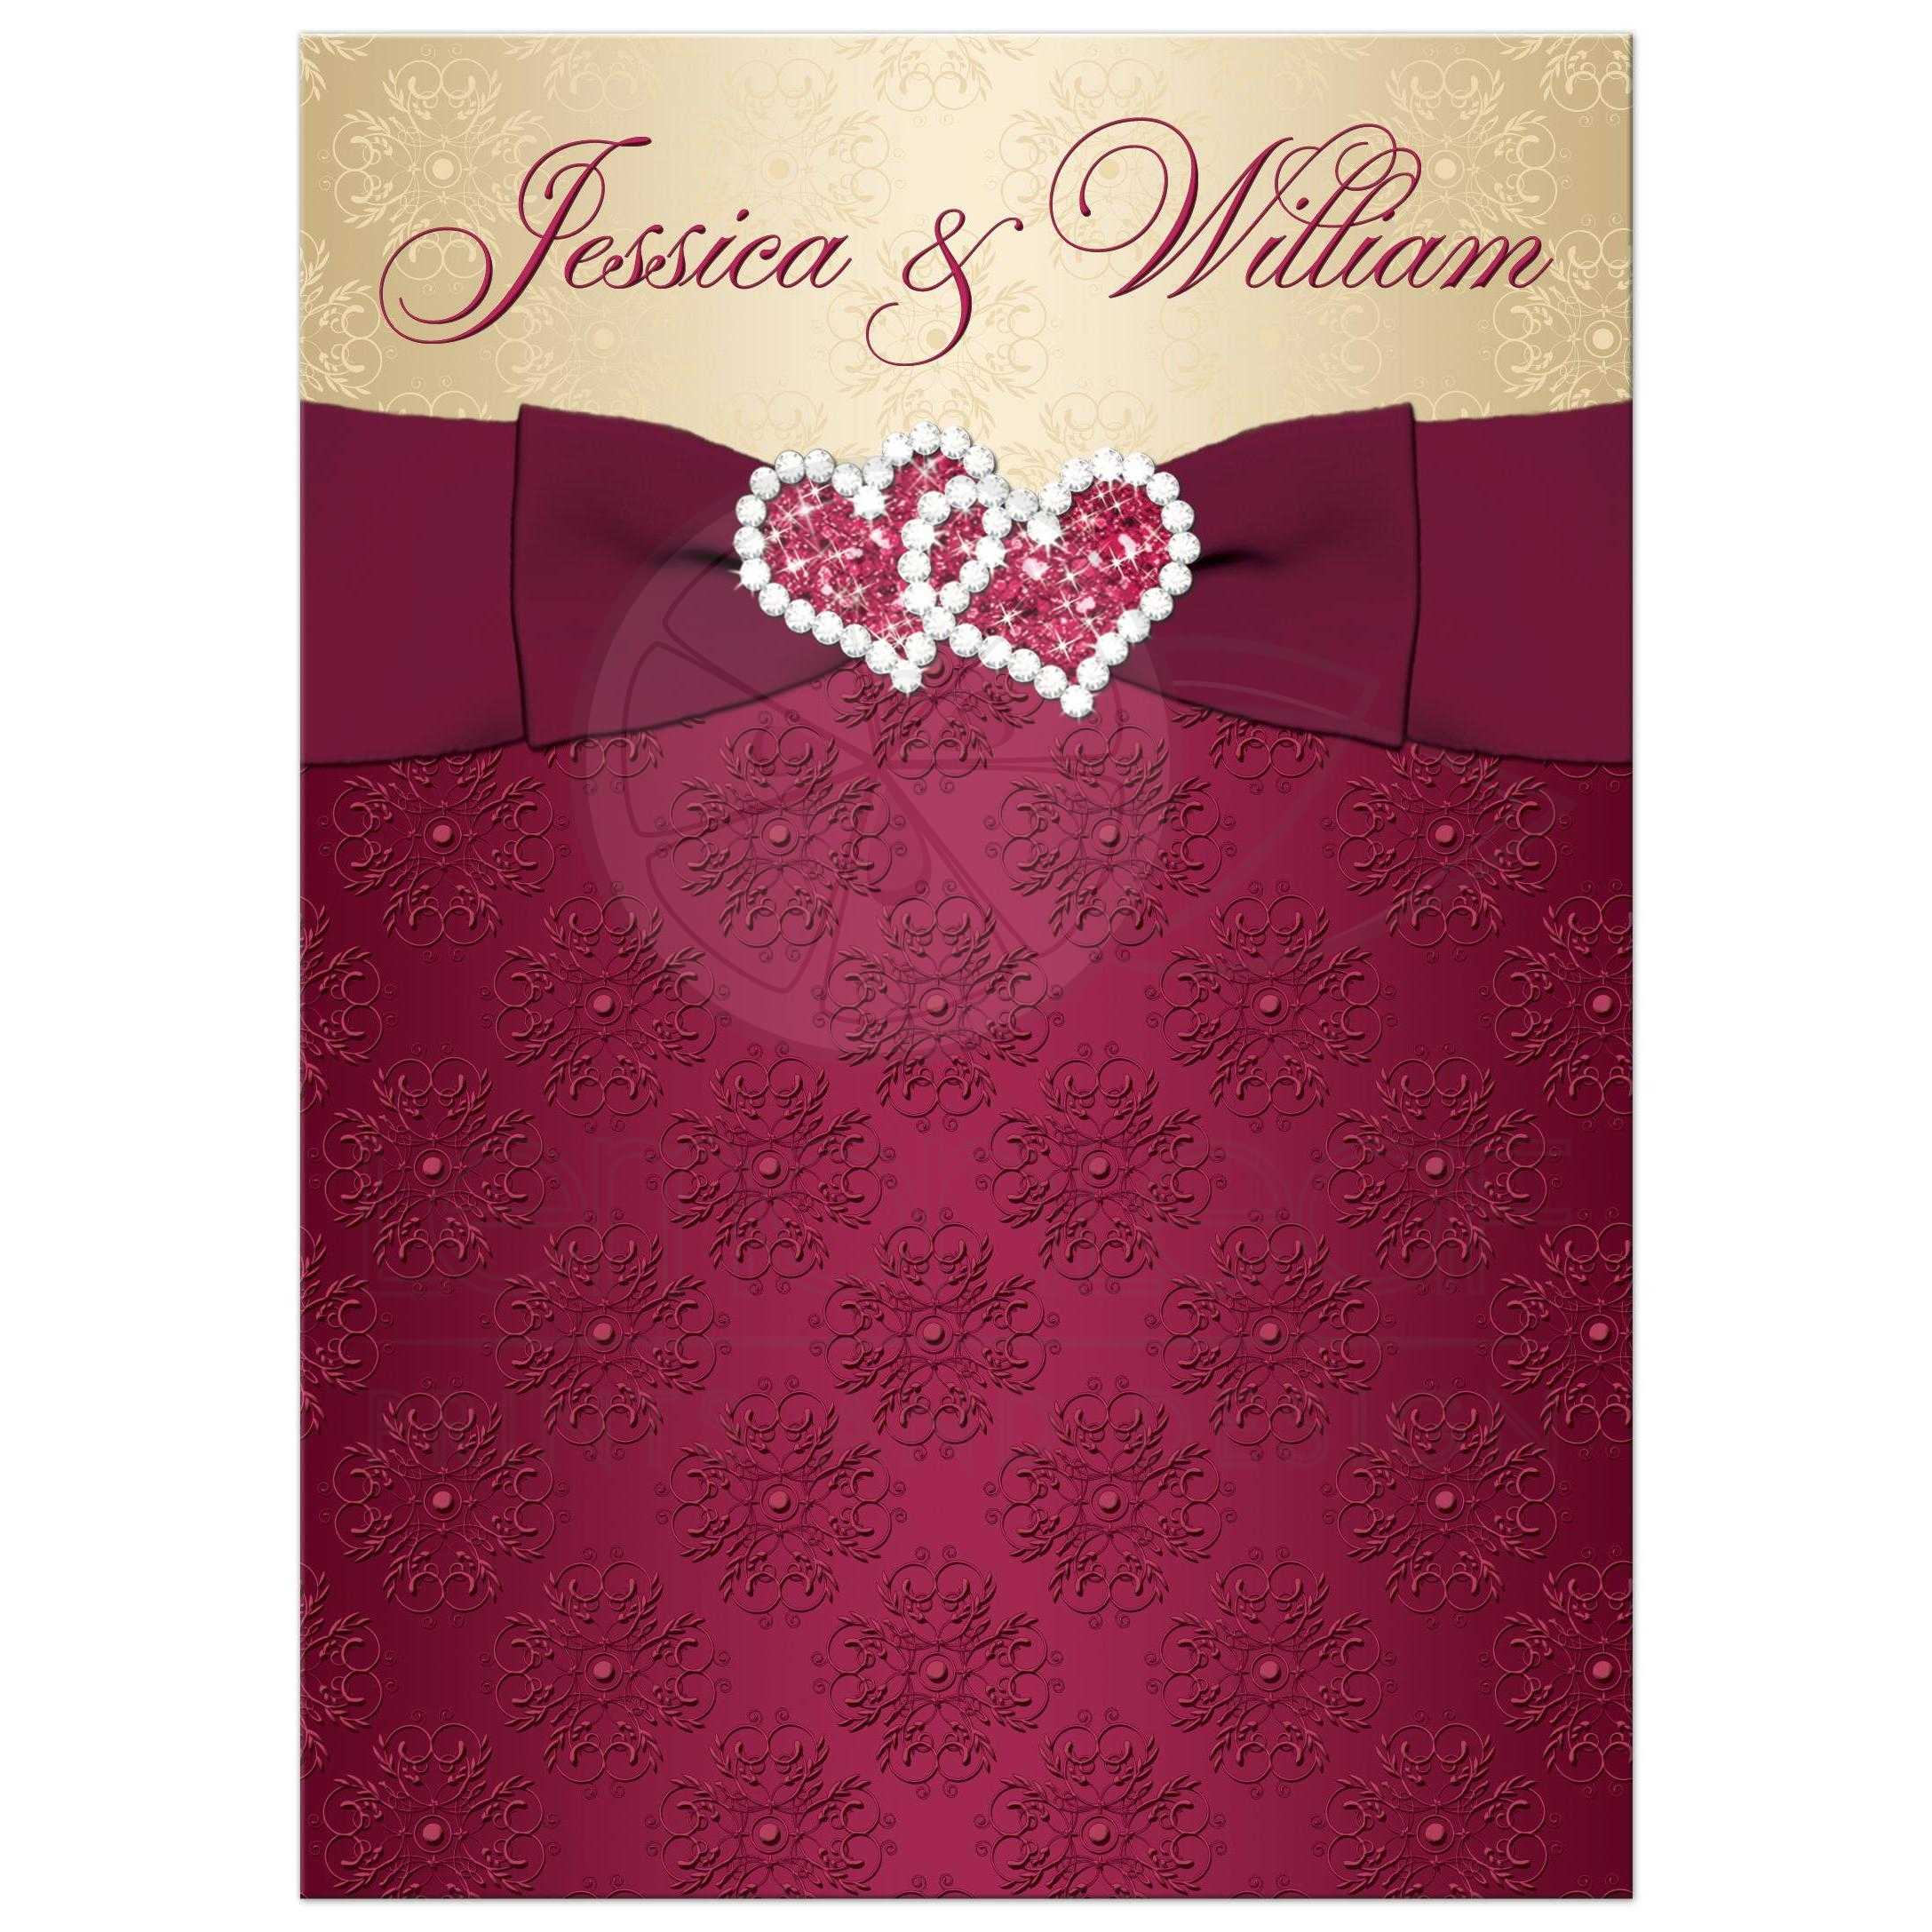 burgundy wedding invitations burgundy wedding invitations wedding invitation burgundy gold damask printed ribbon Wedding invitations